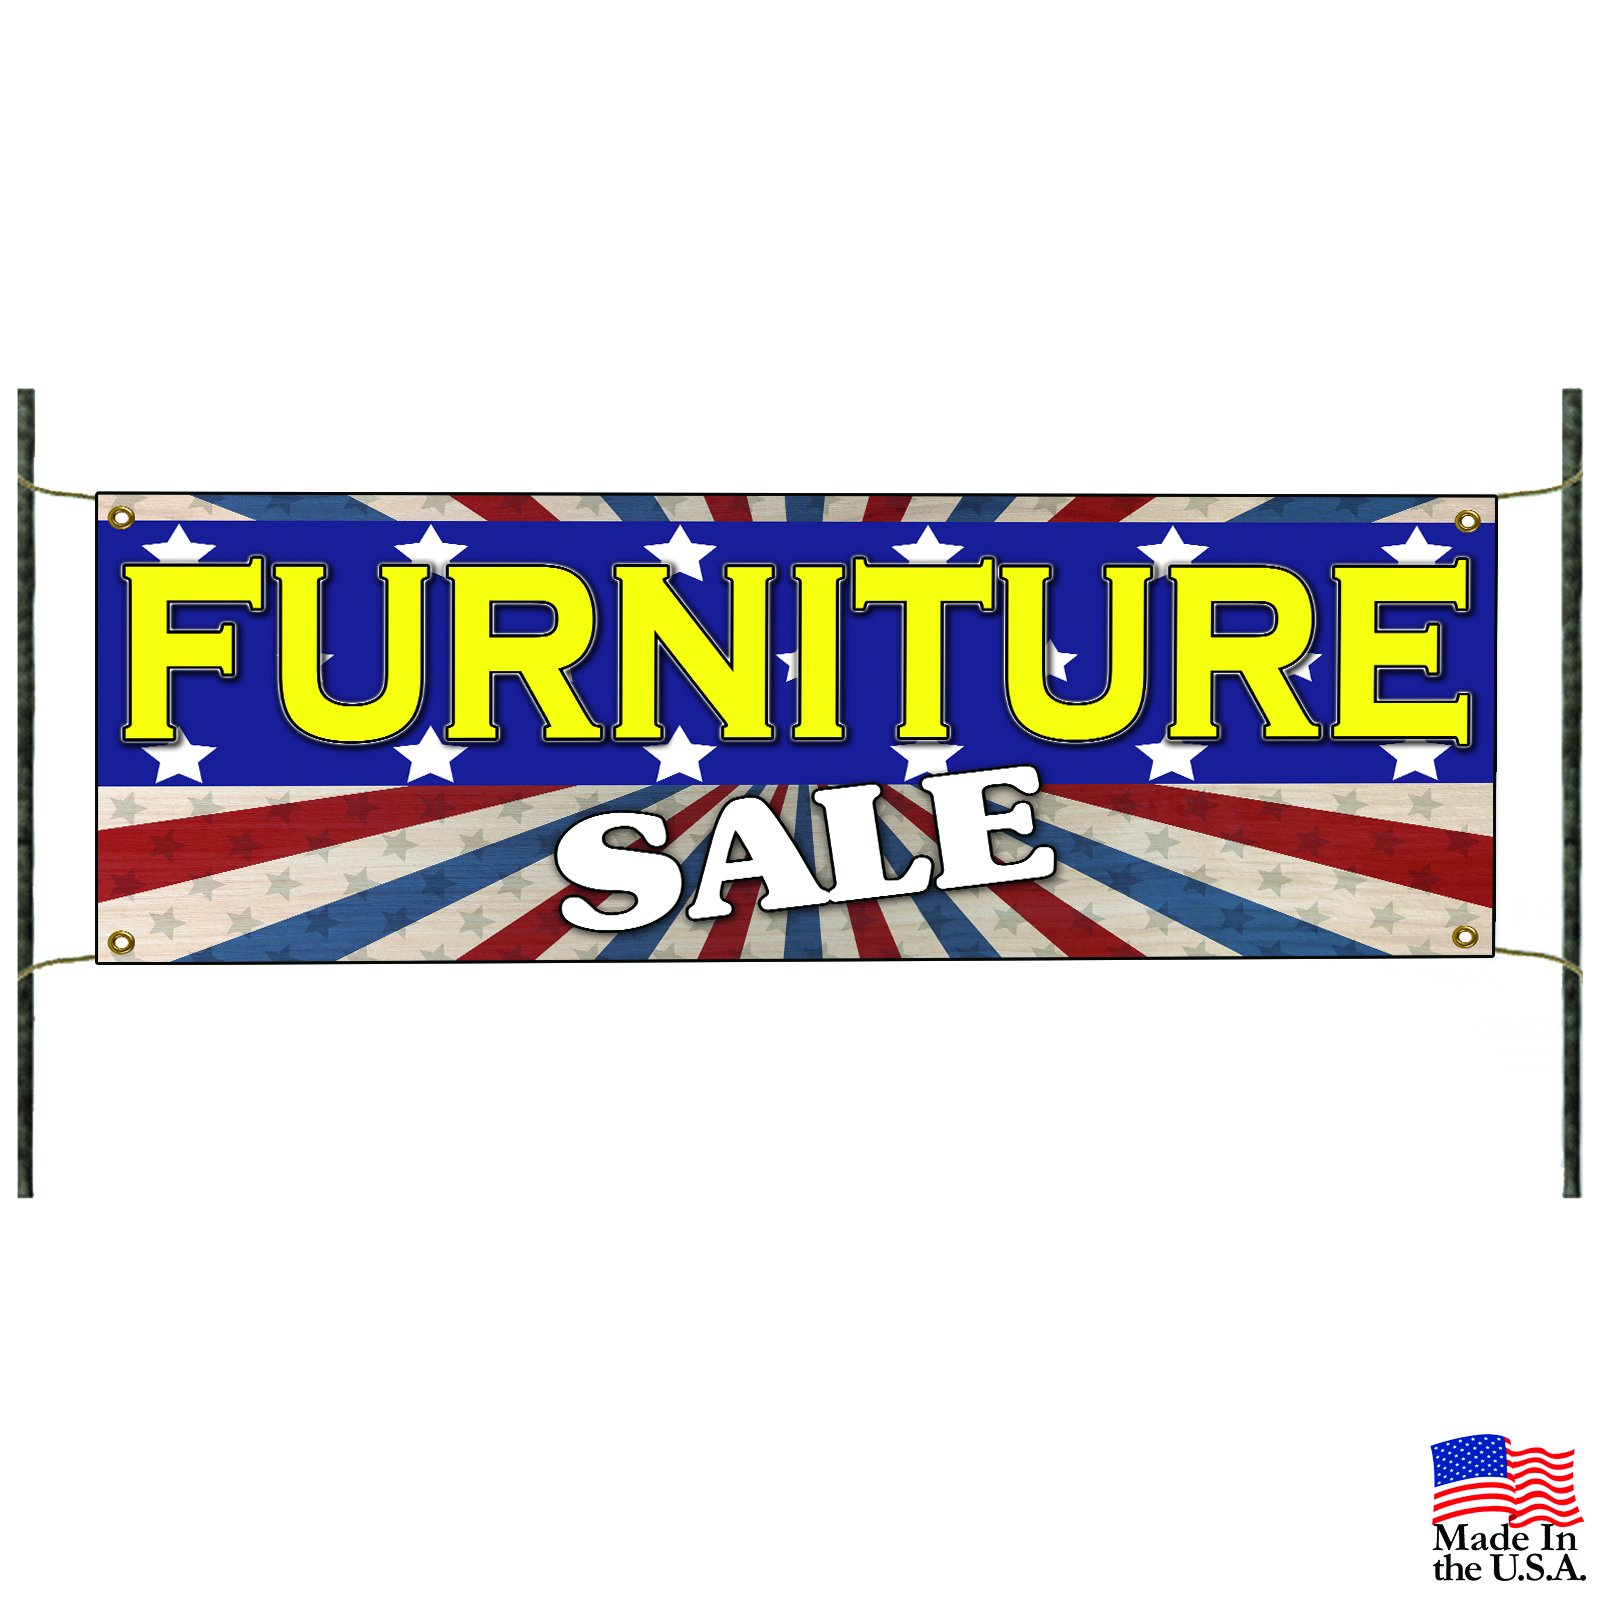 Furniture Sale Home Antique Business Advertising Vinyl Banner Sign